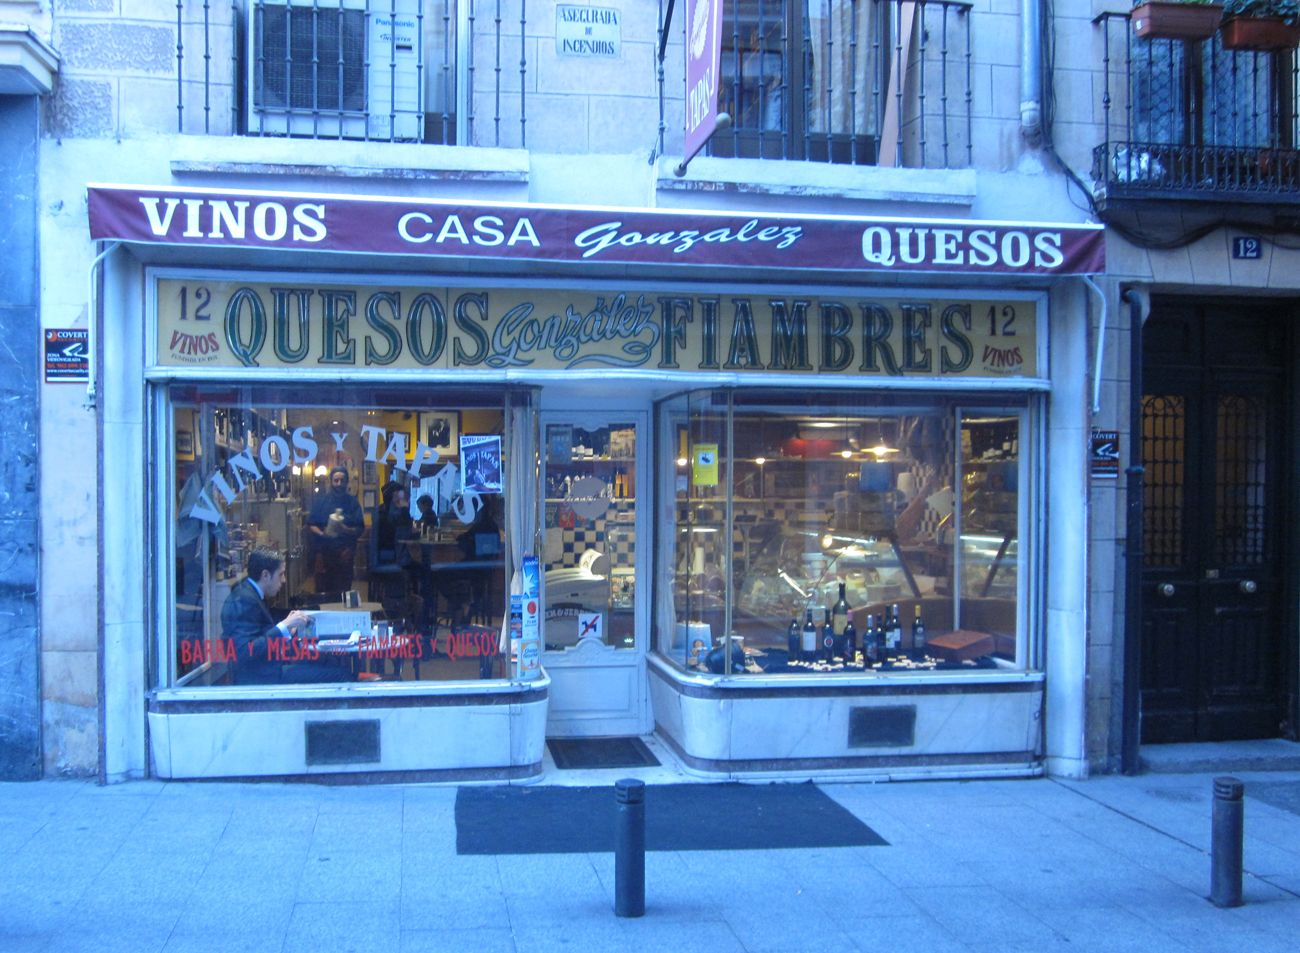 Casa González Vinos Y Quesos Madrid Shop Fronts Liquor Cabinet Model Railroad